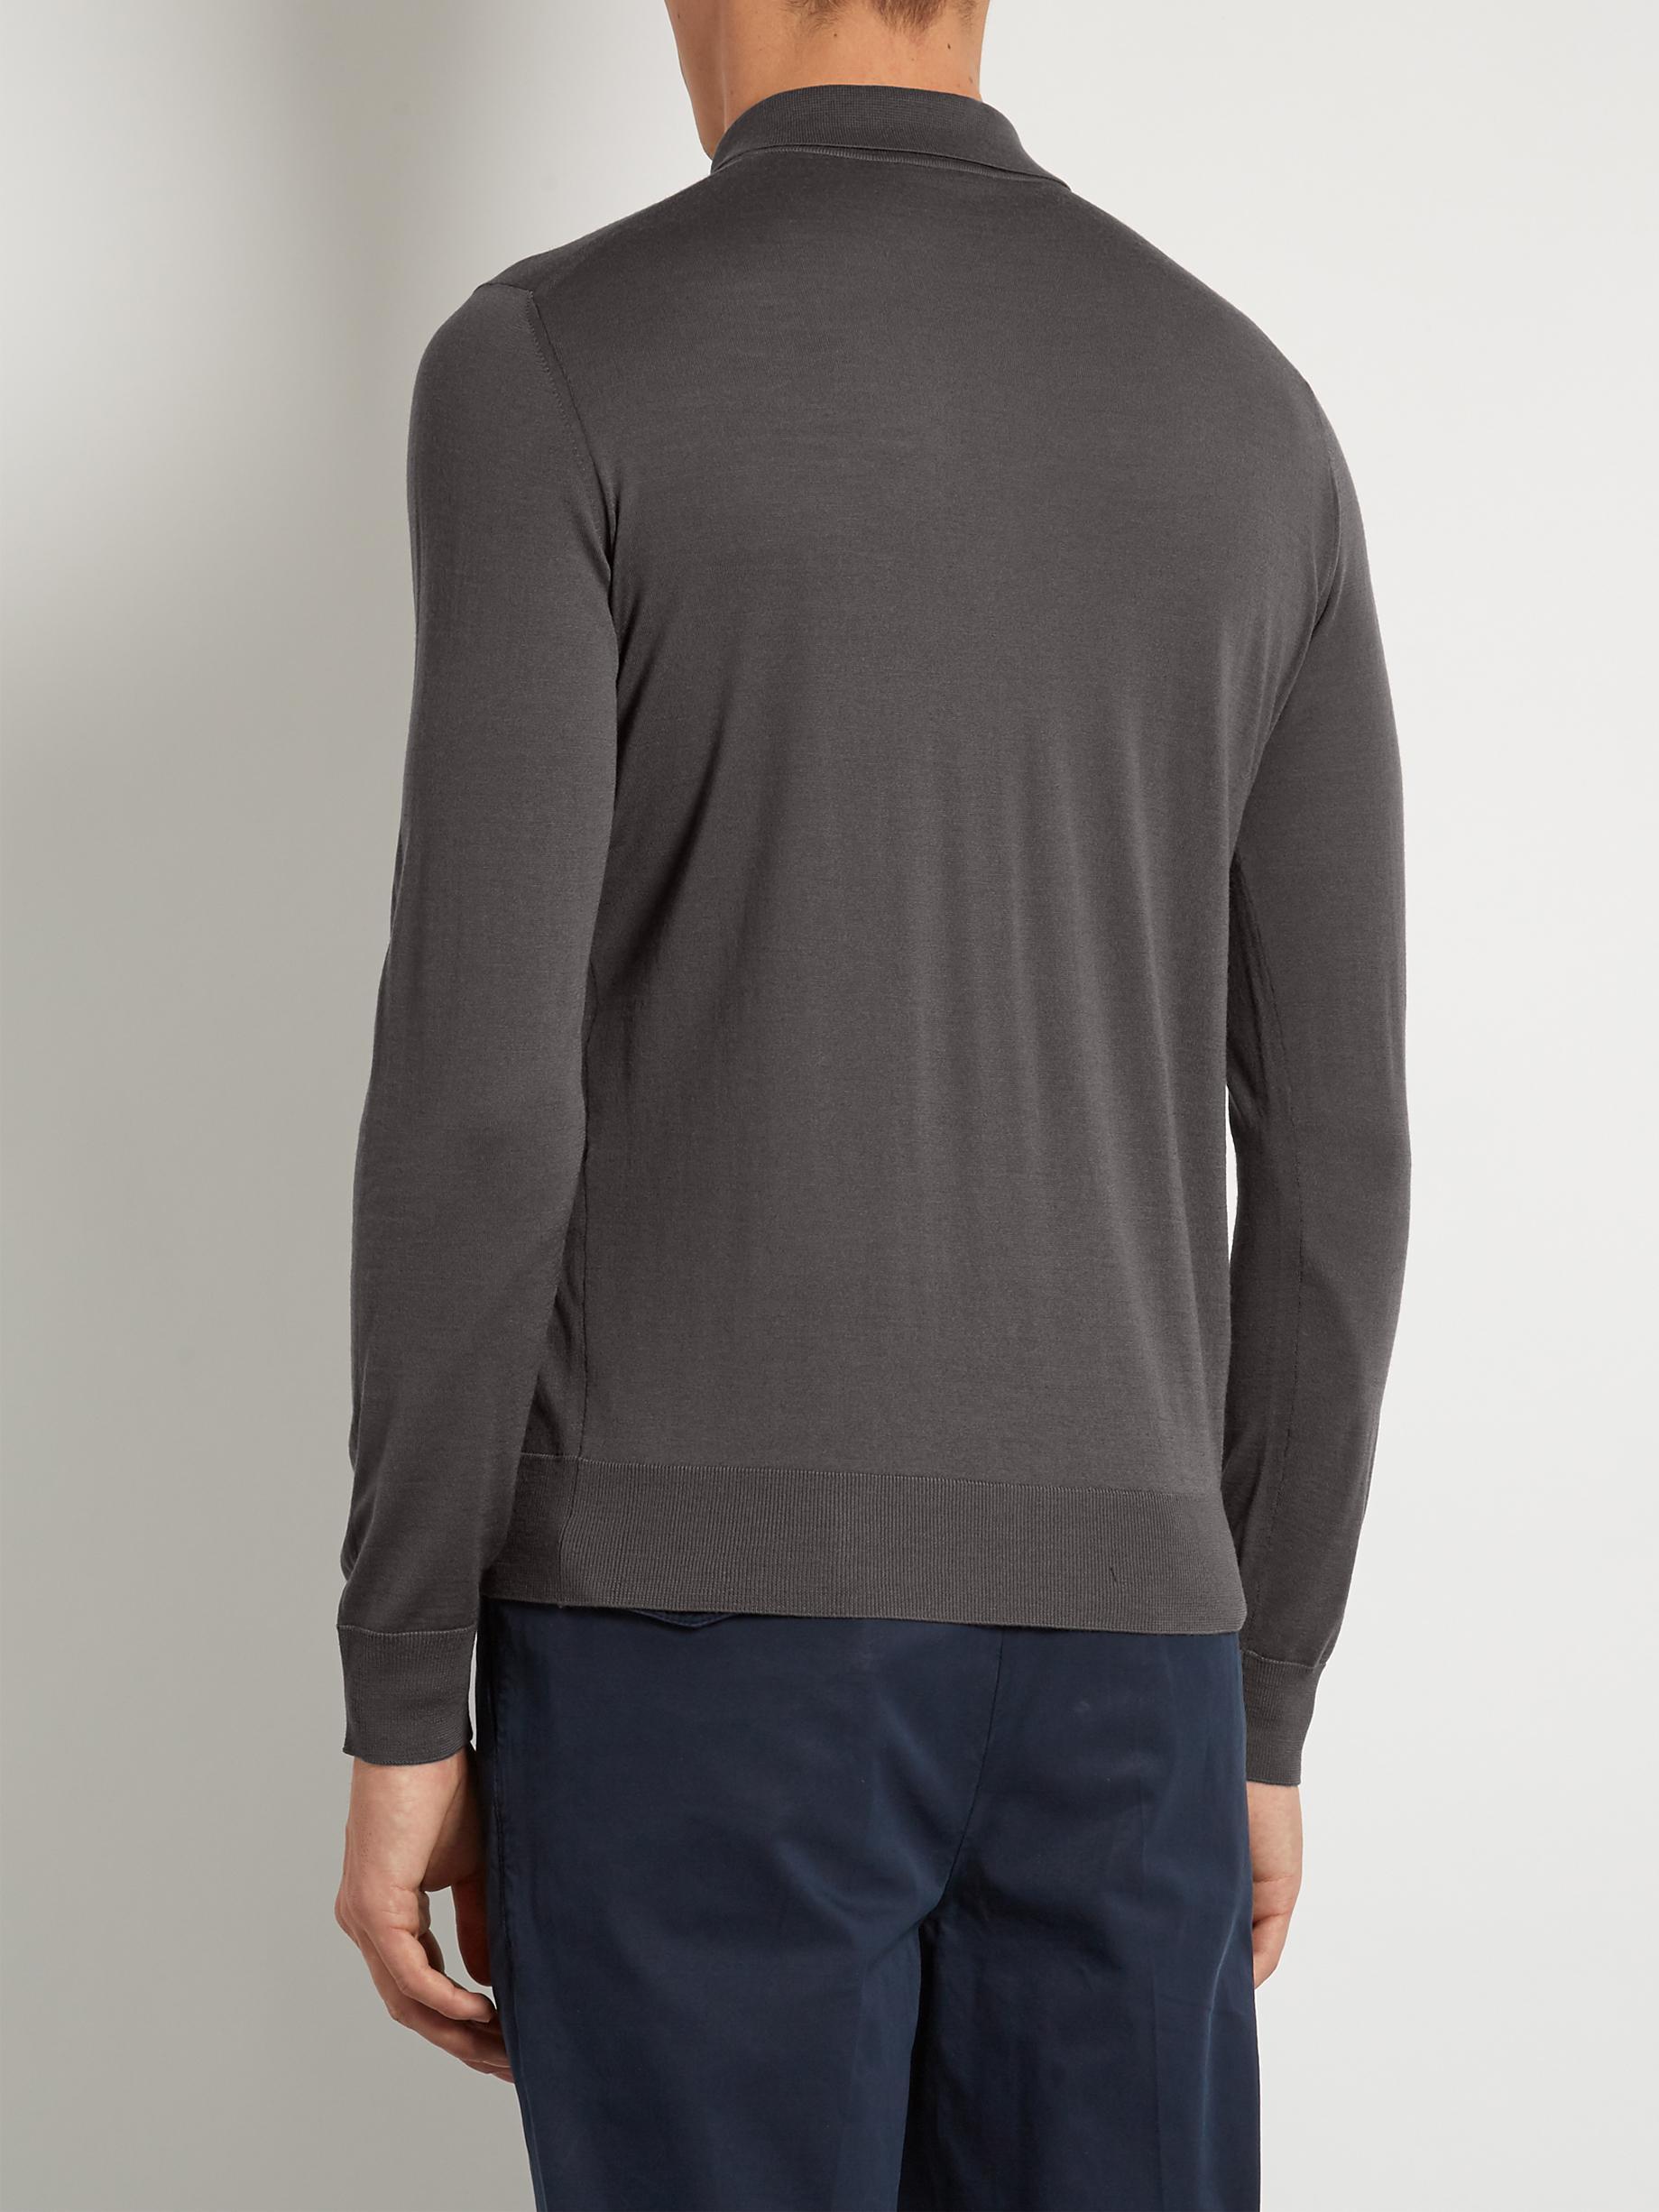 Giorgio armani long sleeved wool polo shirt in gray for for Long sleeve wool polo shirts